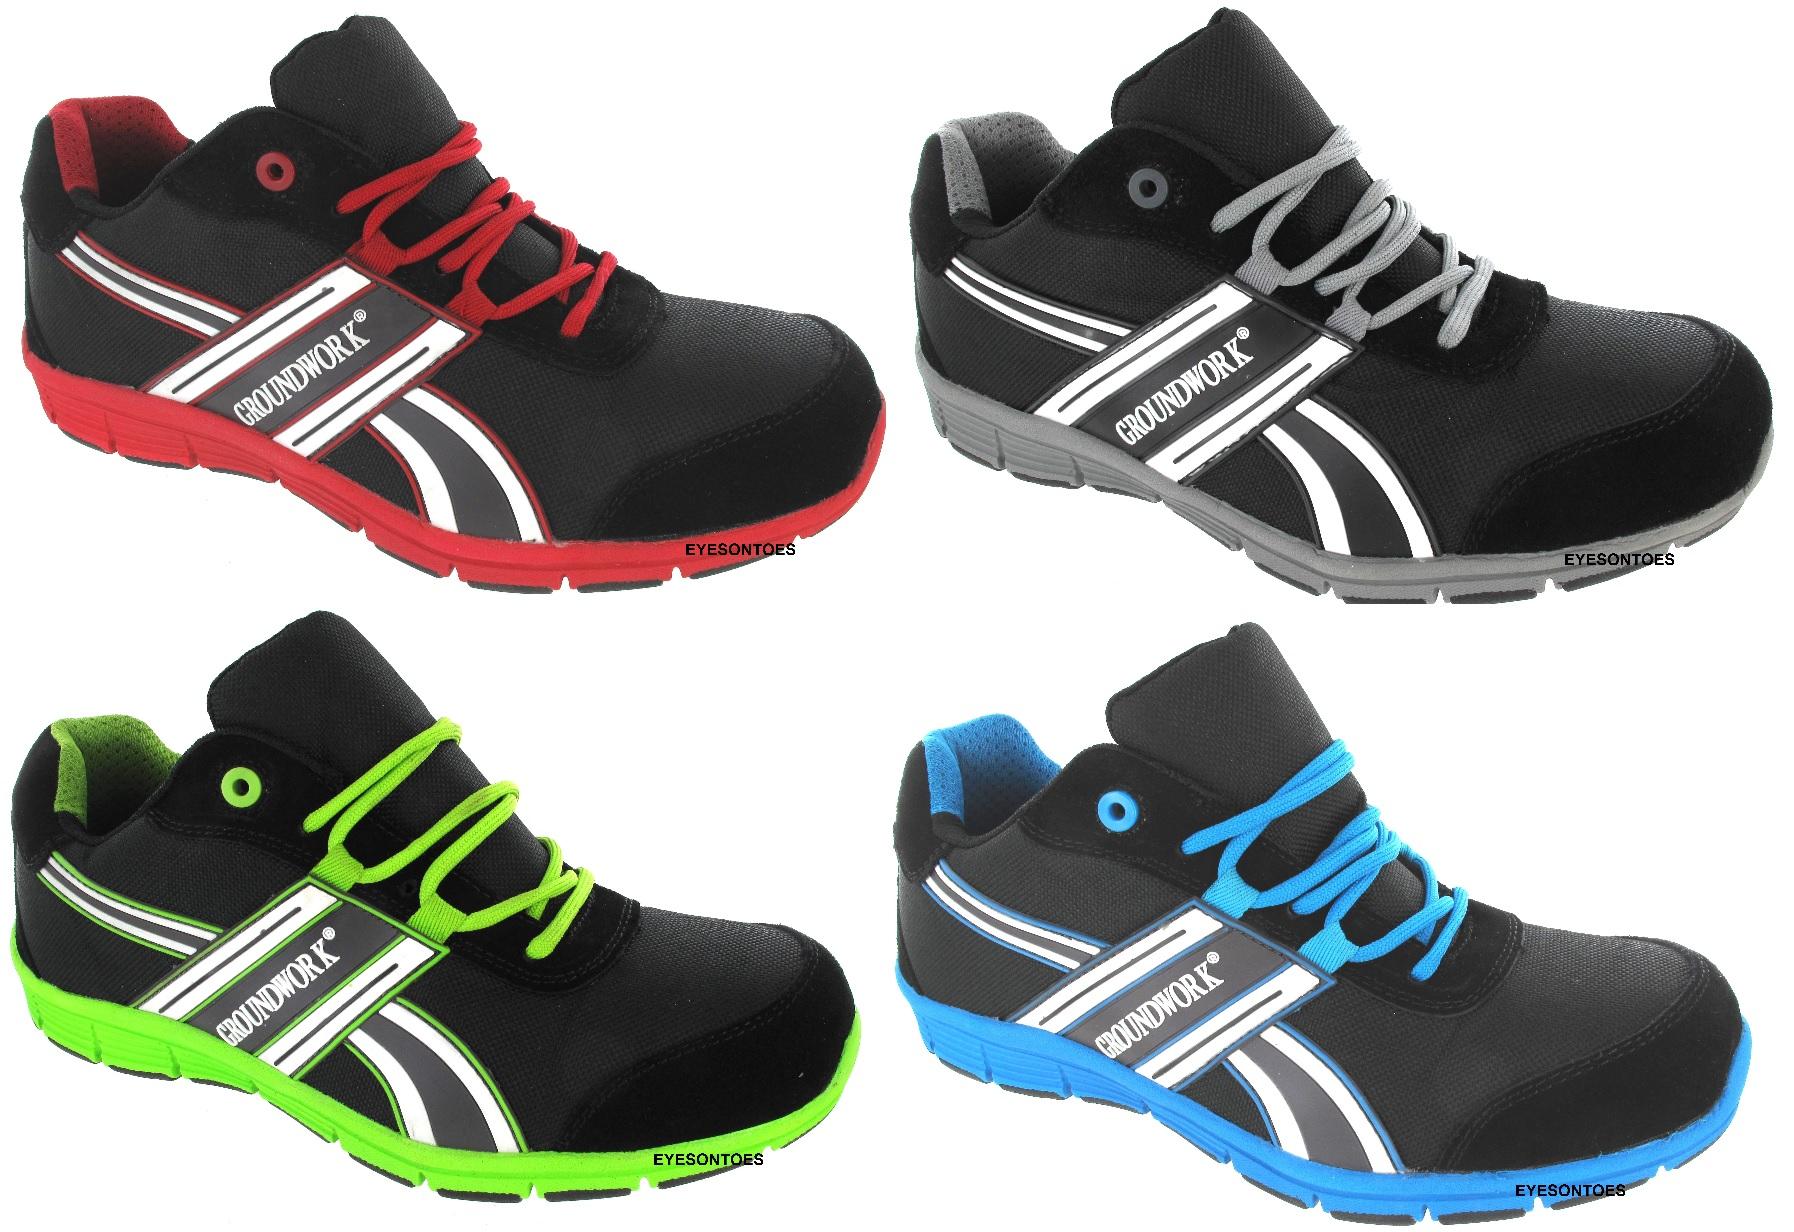 mens sport groundwork lightweight trainers steel toe cap. Black Bedroom Furniture Sets. Home Design Ideas